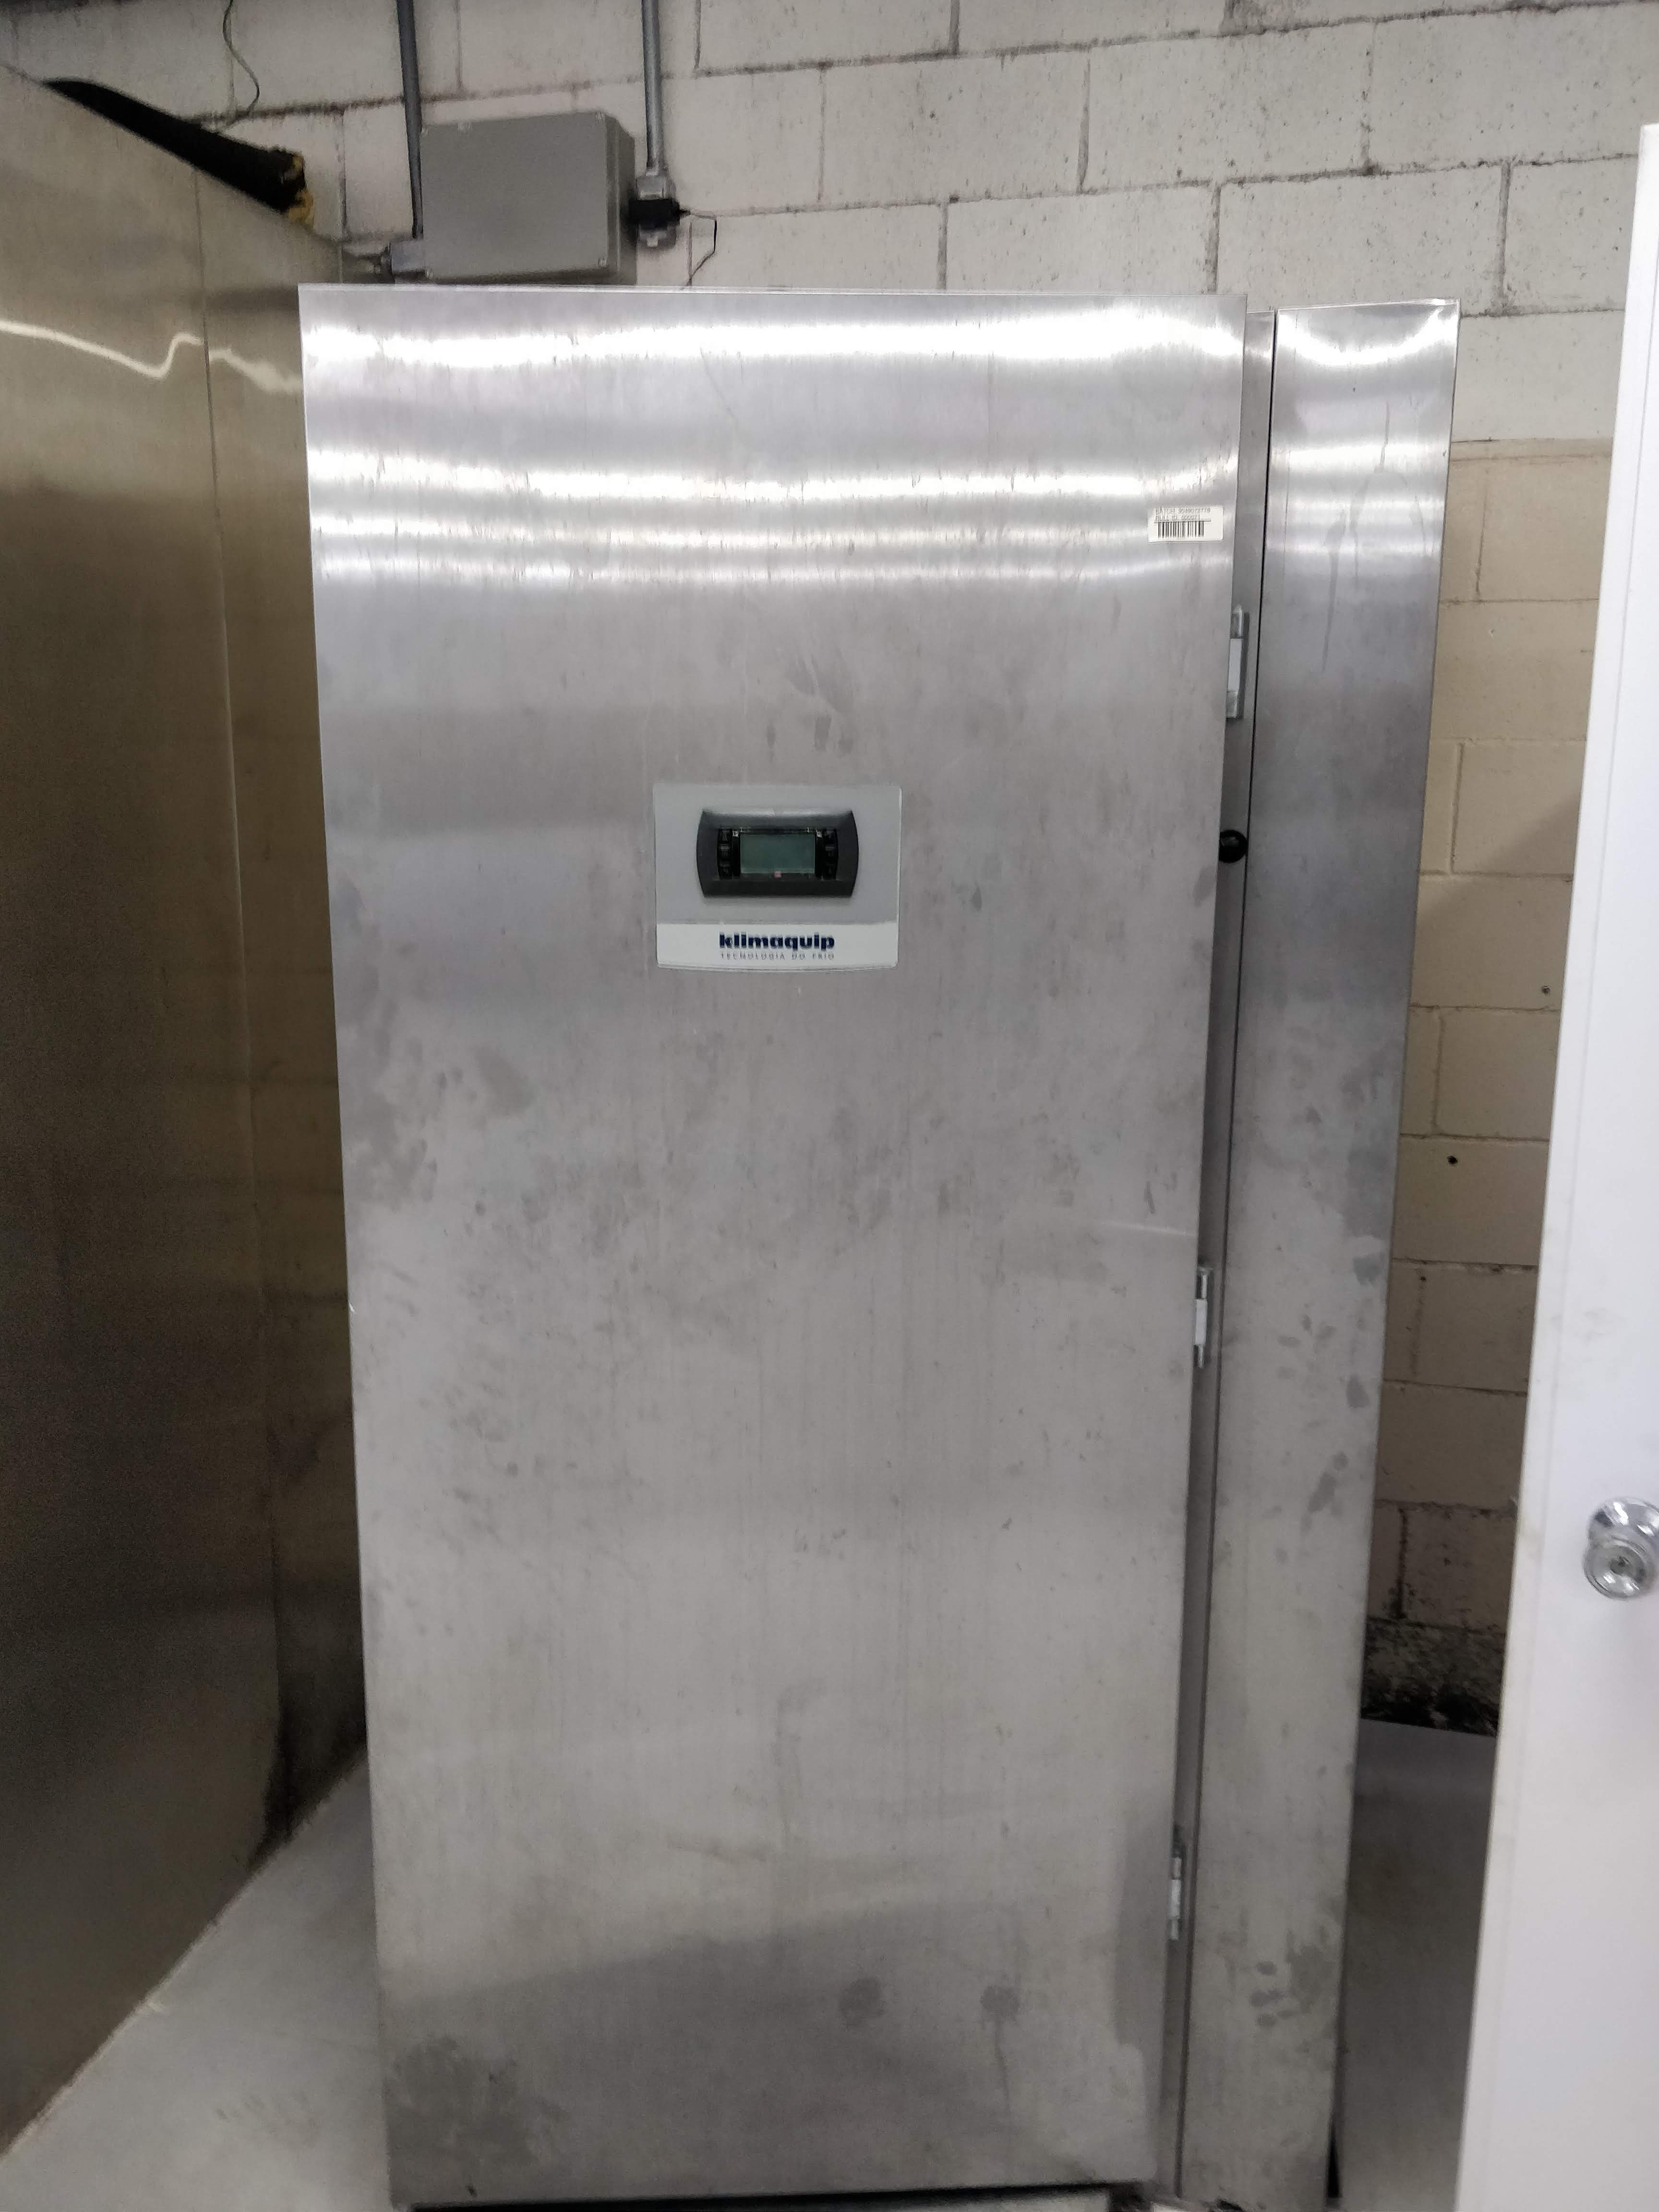 Ultracongelador UK 20 remoto G3